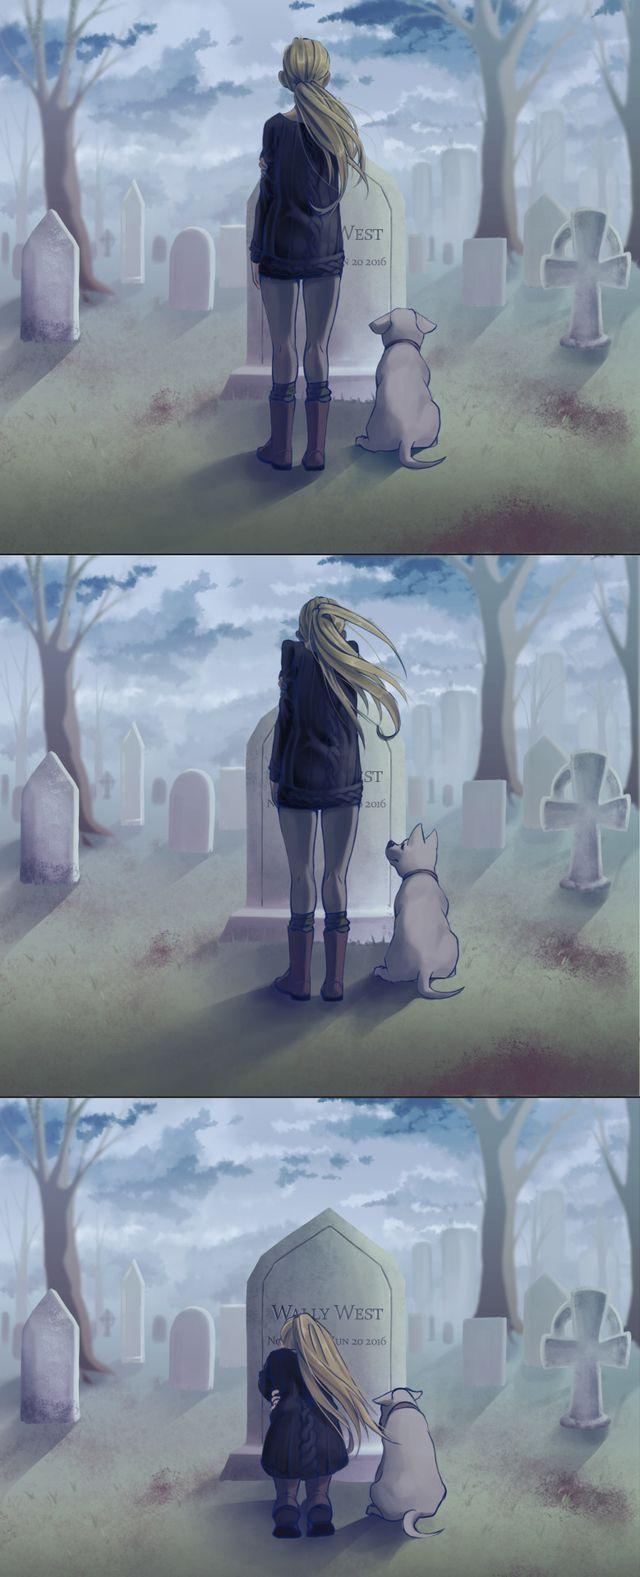 Noo too sad. Why WHY WALLY WHY